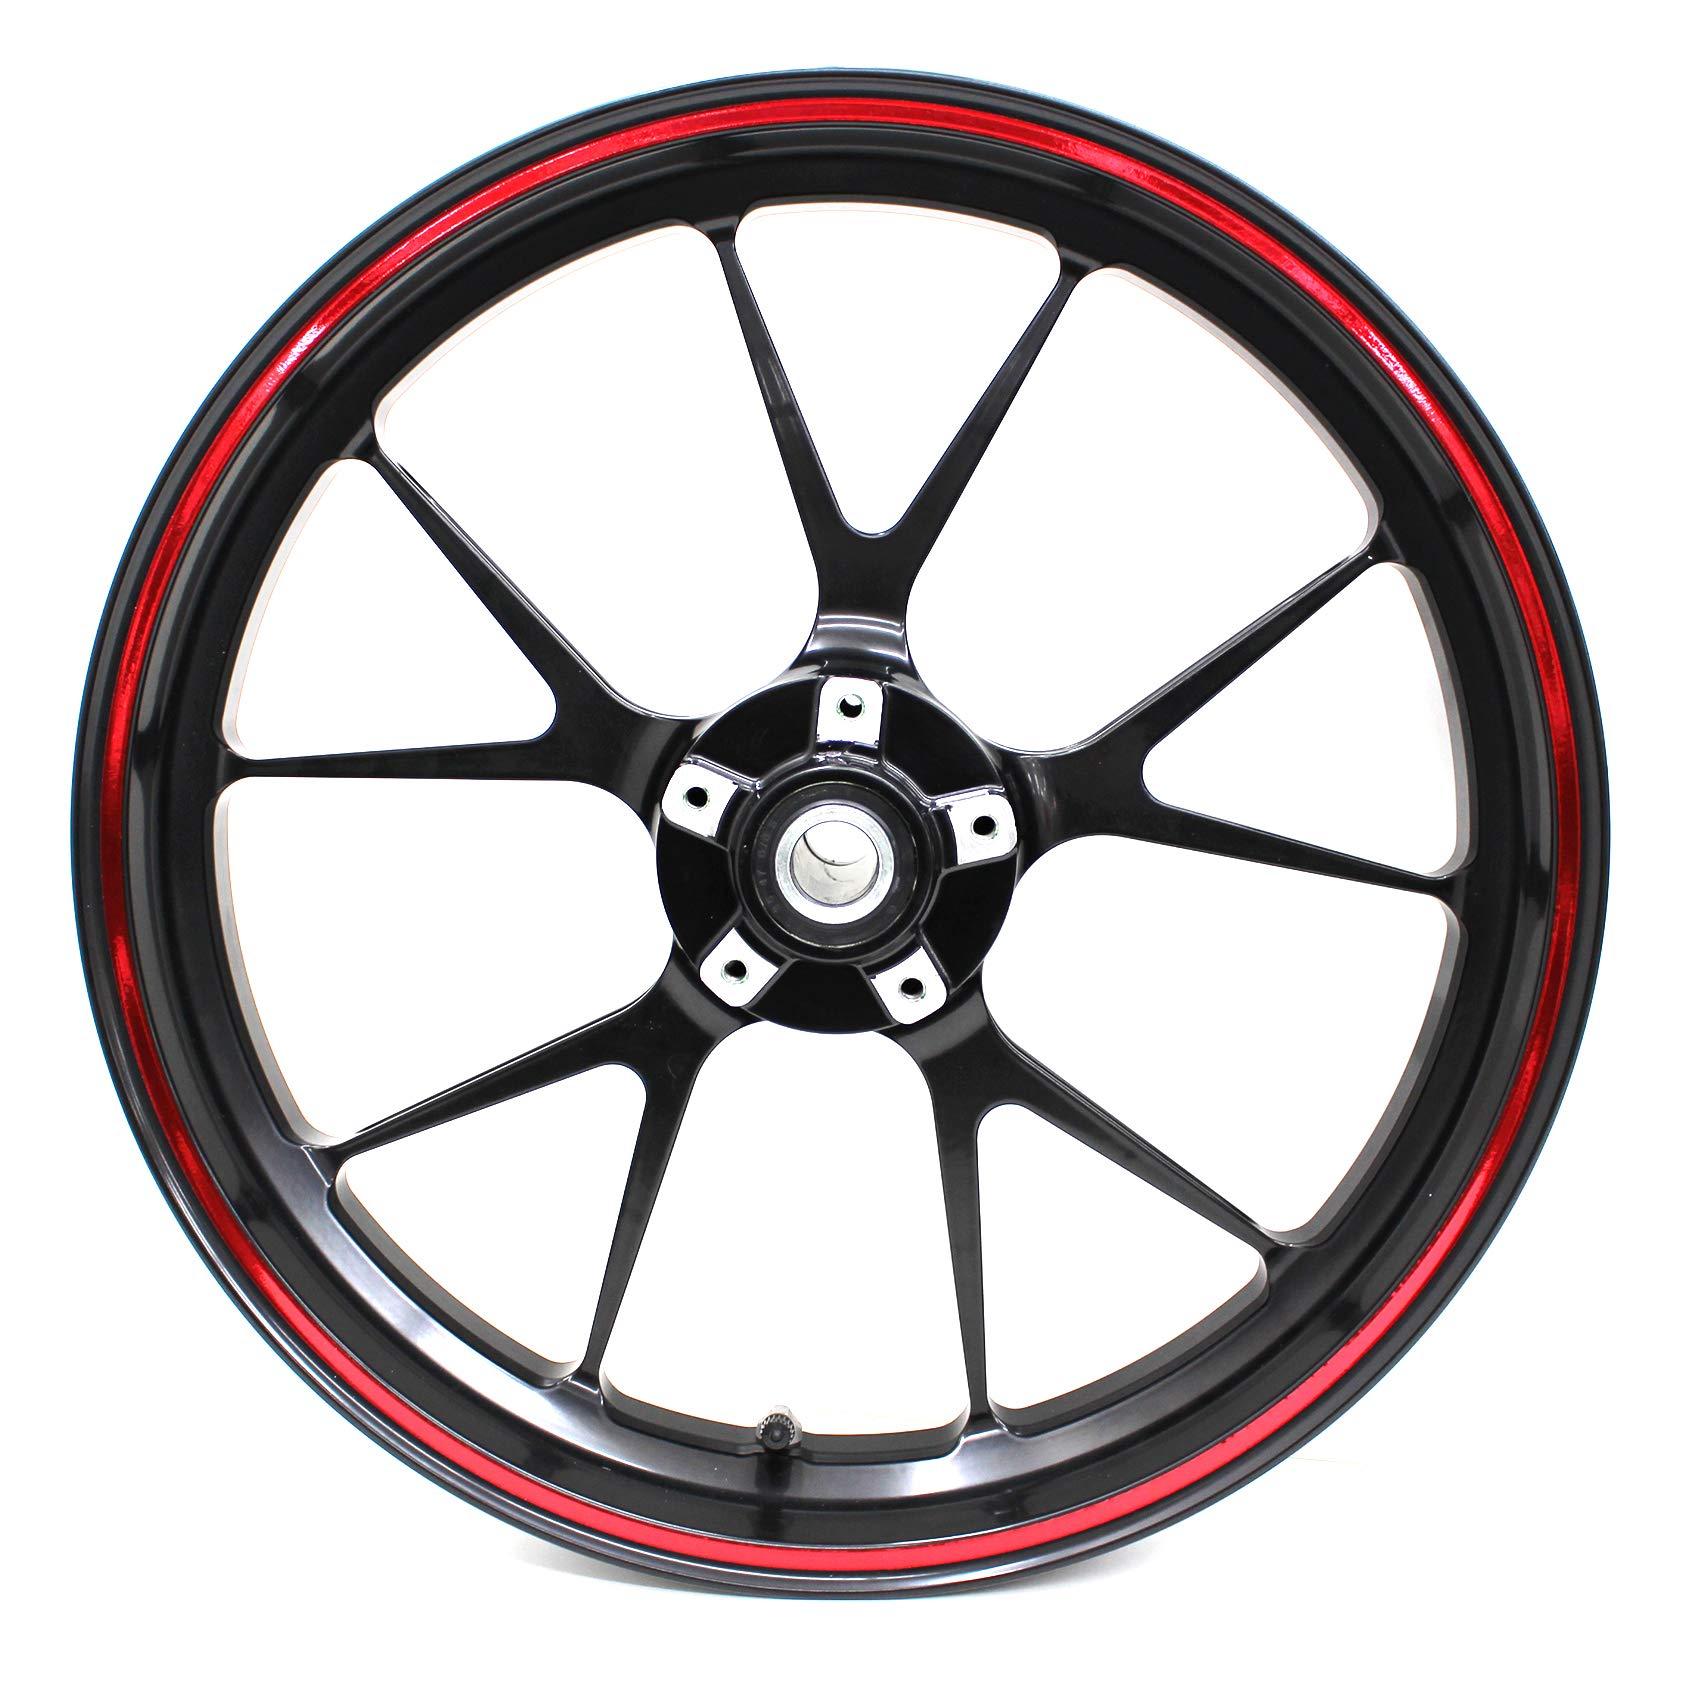 Luerme 2pcs Bike Wheel Rim Tape Strips Anti-Blow High Pressure Bicycle Rim Liner Cushion 12~29